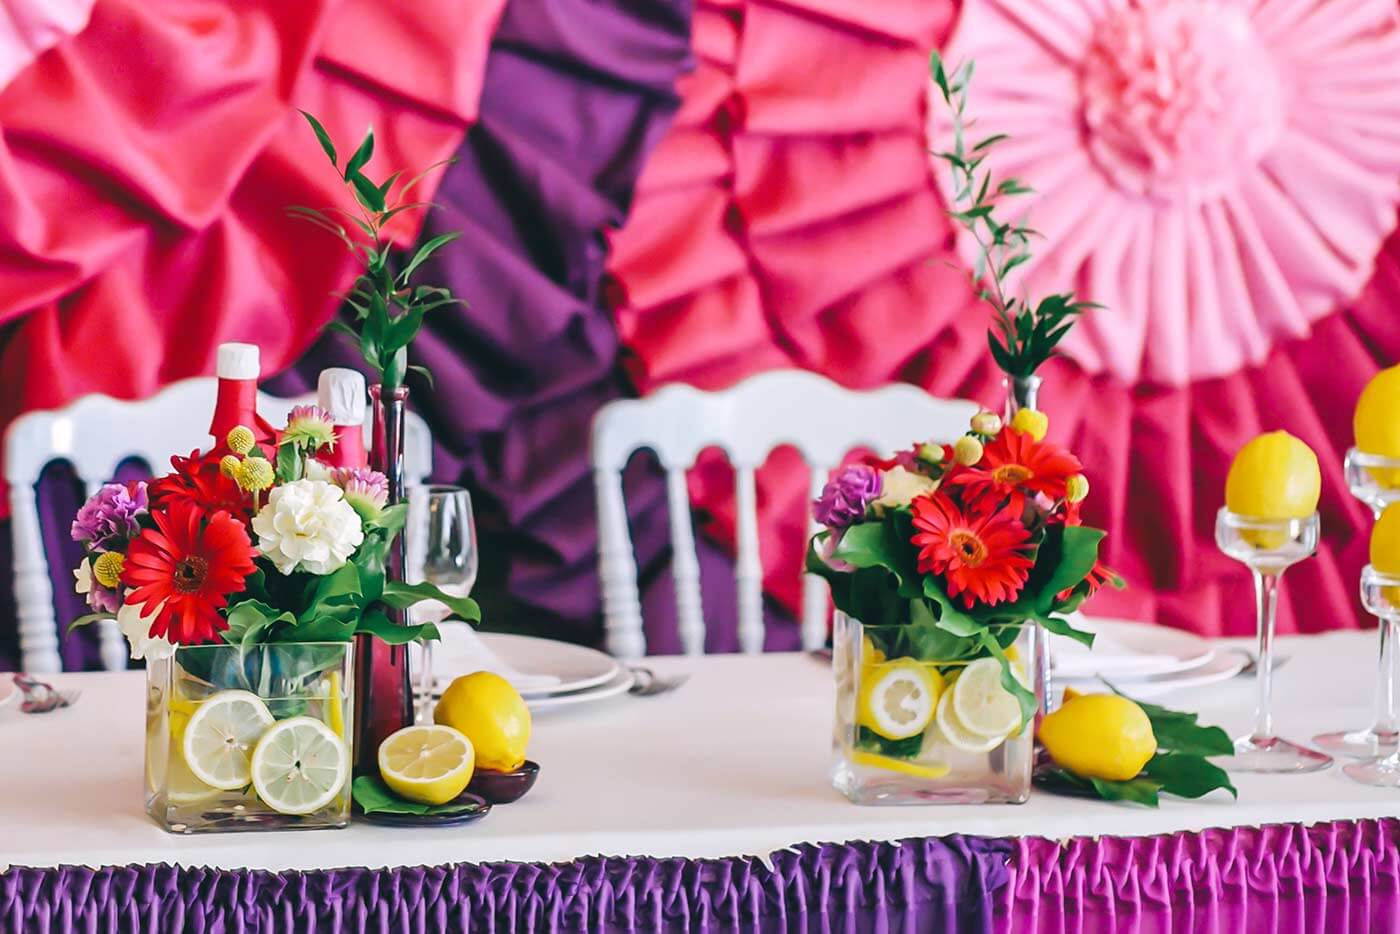 Tischdeko mit Zitronen